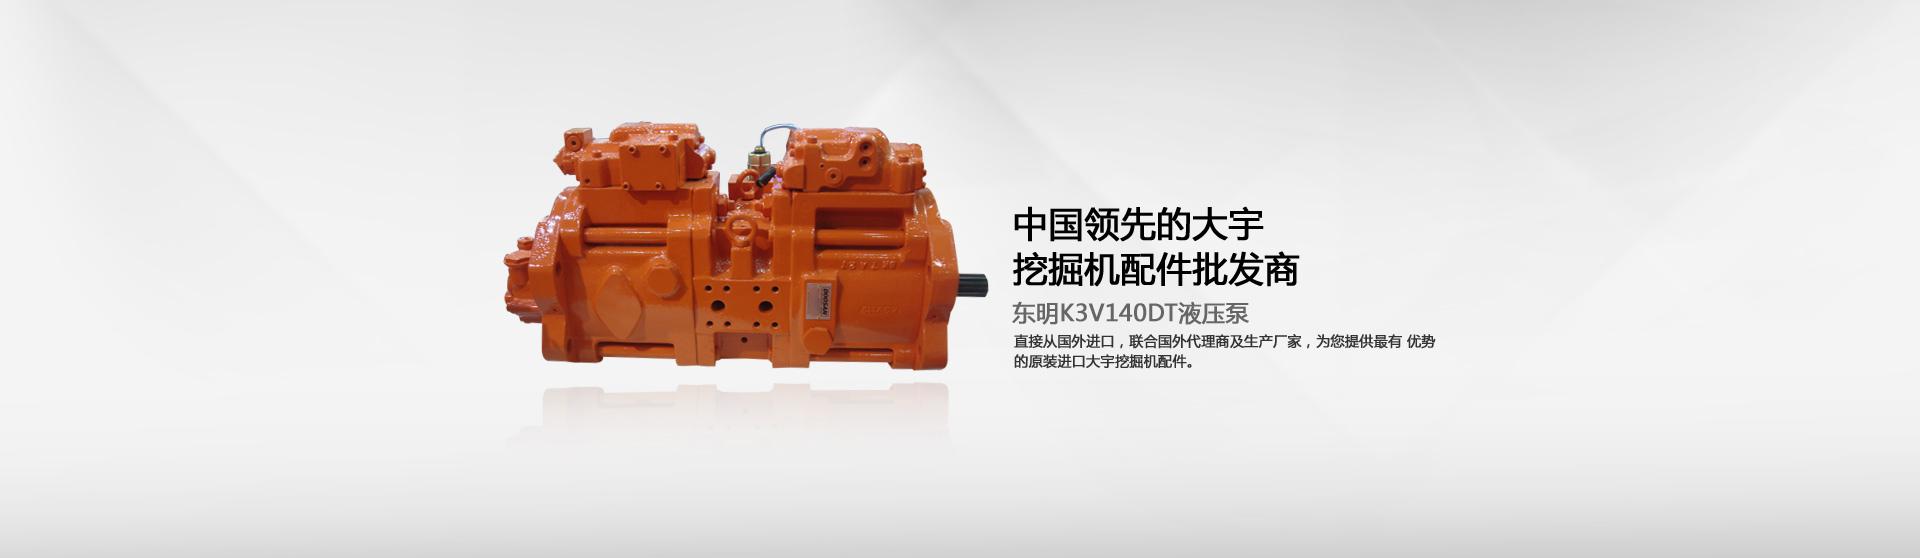 东明K3V140DT液压泵